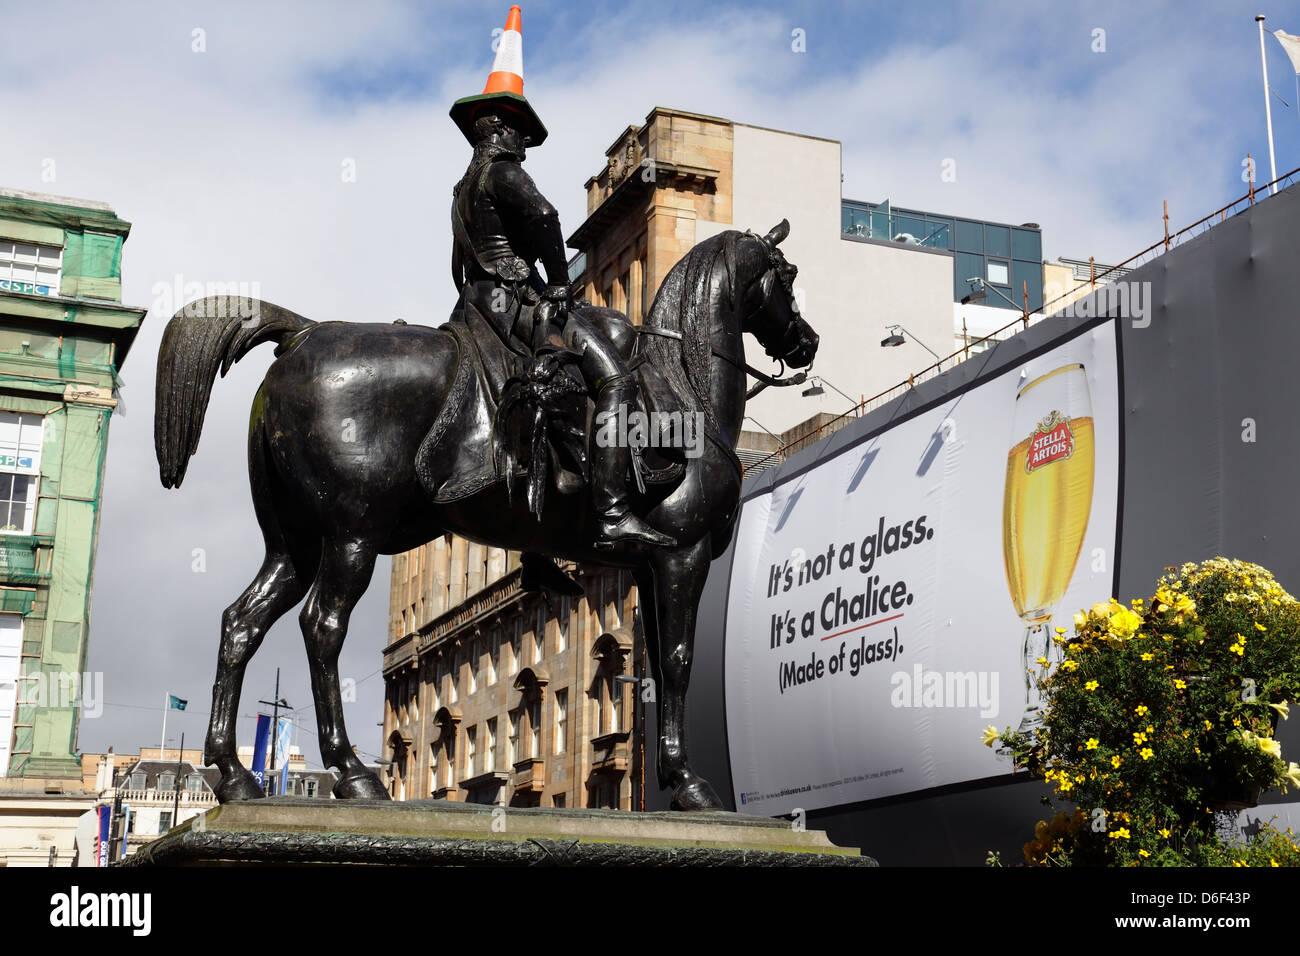 The statue of the Duke of Wellington, Glasgow city centre, Scotland, UK - Stock Image